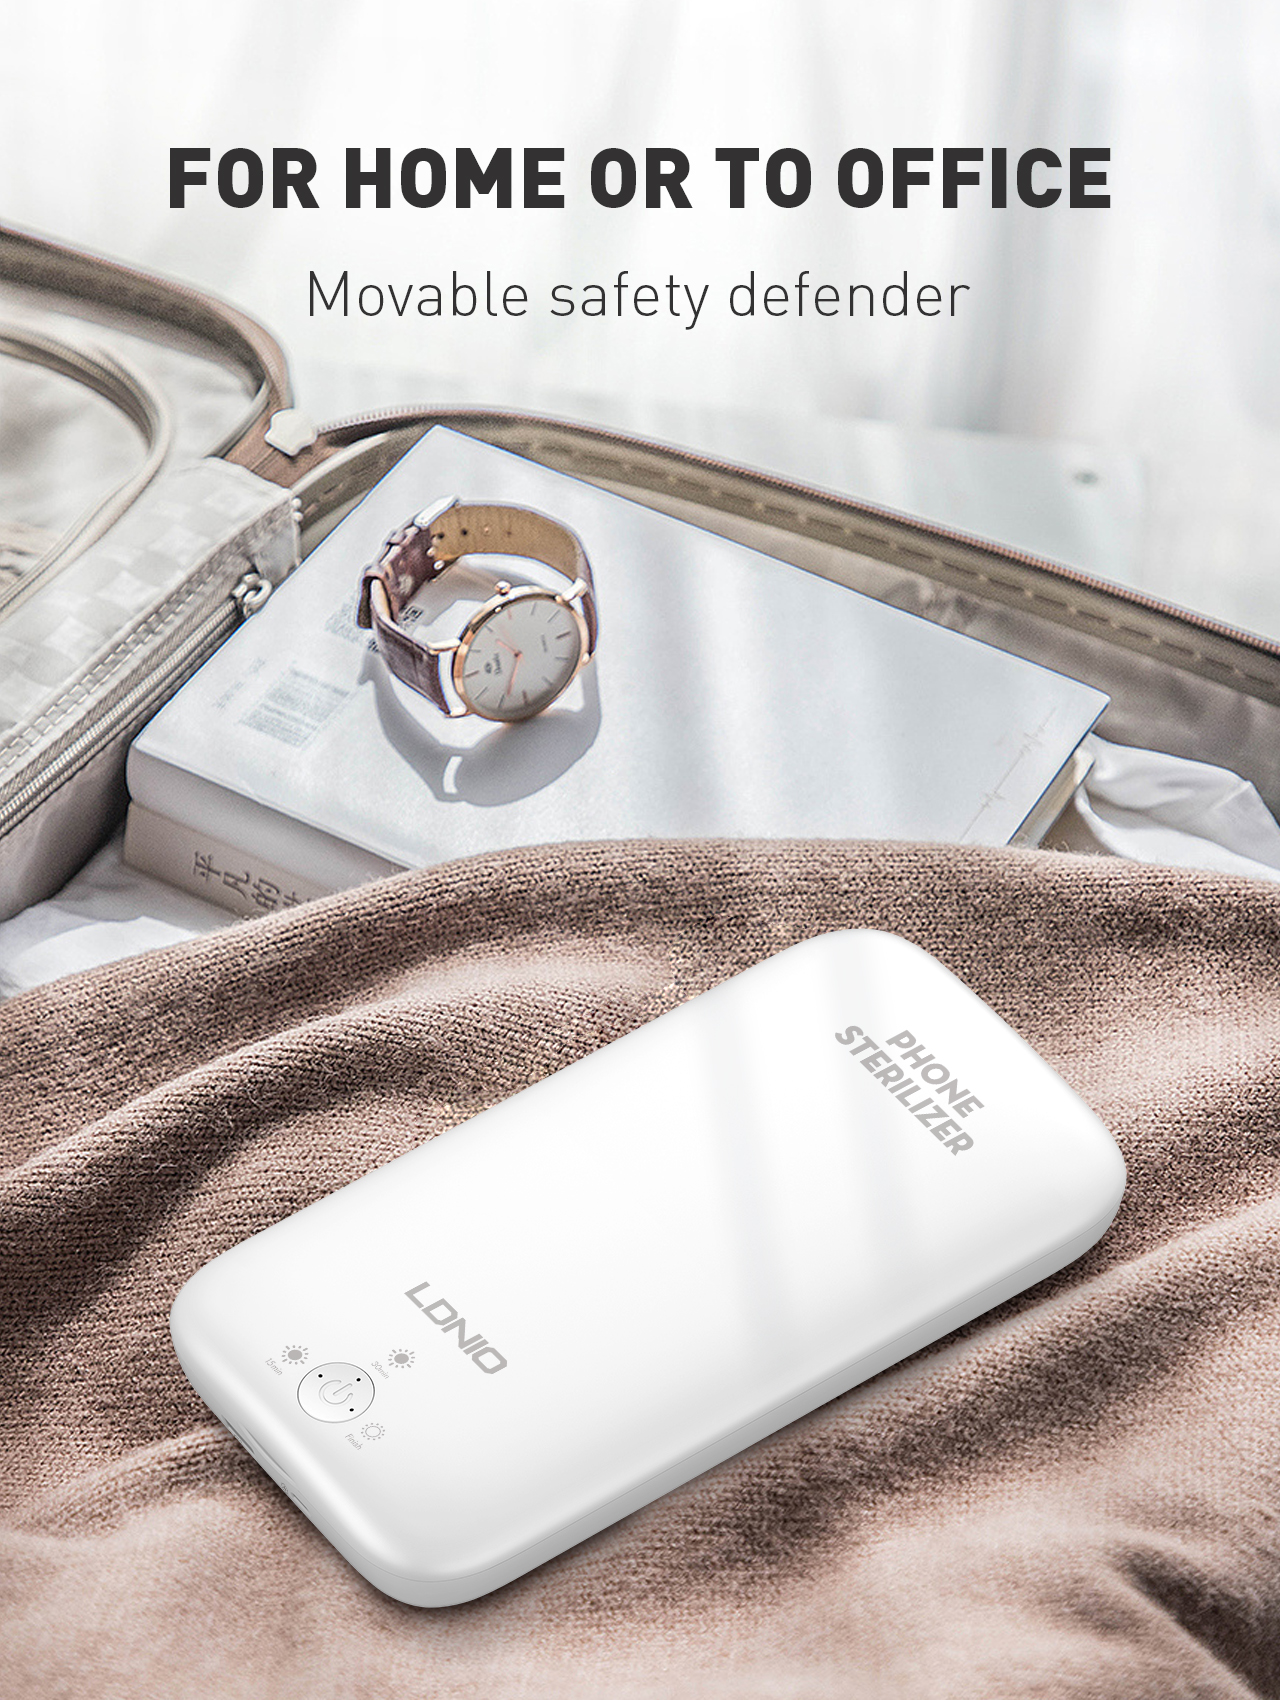 LDNIO UV Light Sanitizer Box, UVC Sterilizer for Smartphone Clinically Proven Kills 99.9% of Germs Viruses & Bacteria